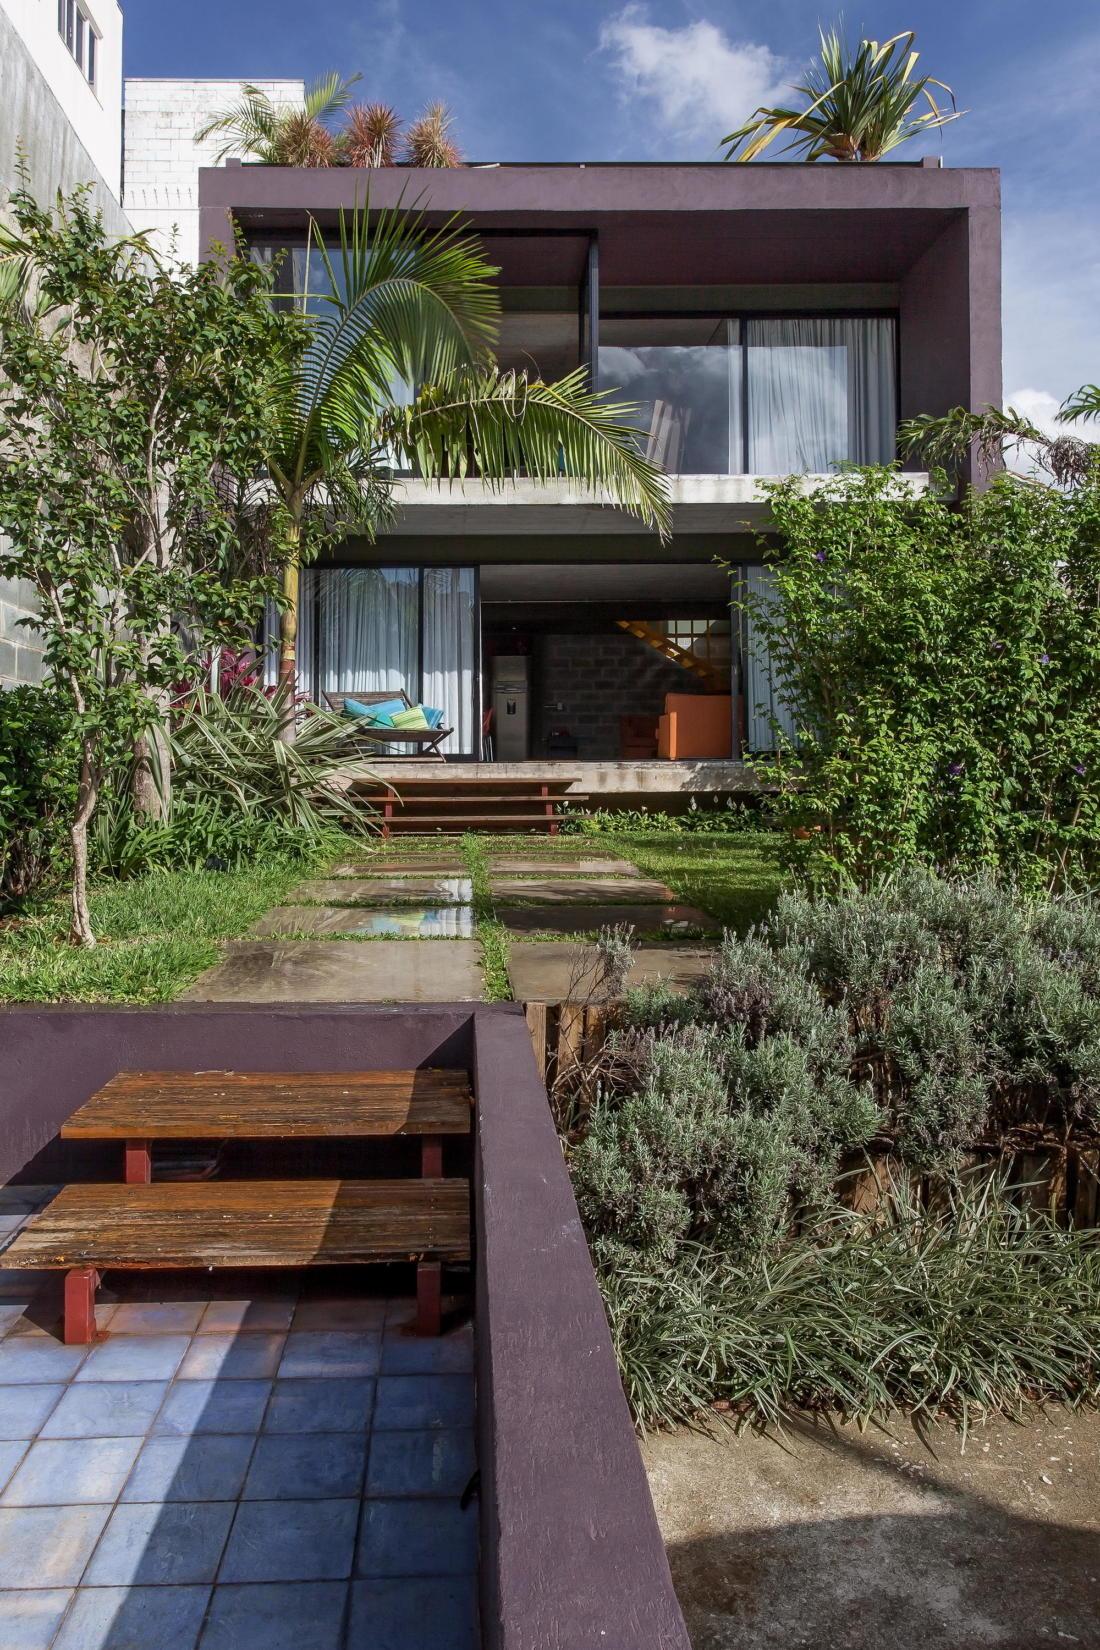 Богемный интерьер дома в Бразилии от ARKITITO Arquitetura 9